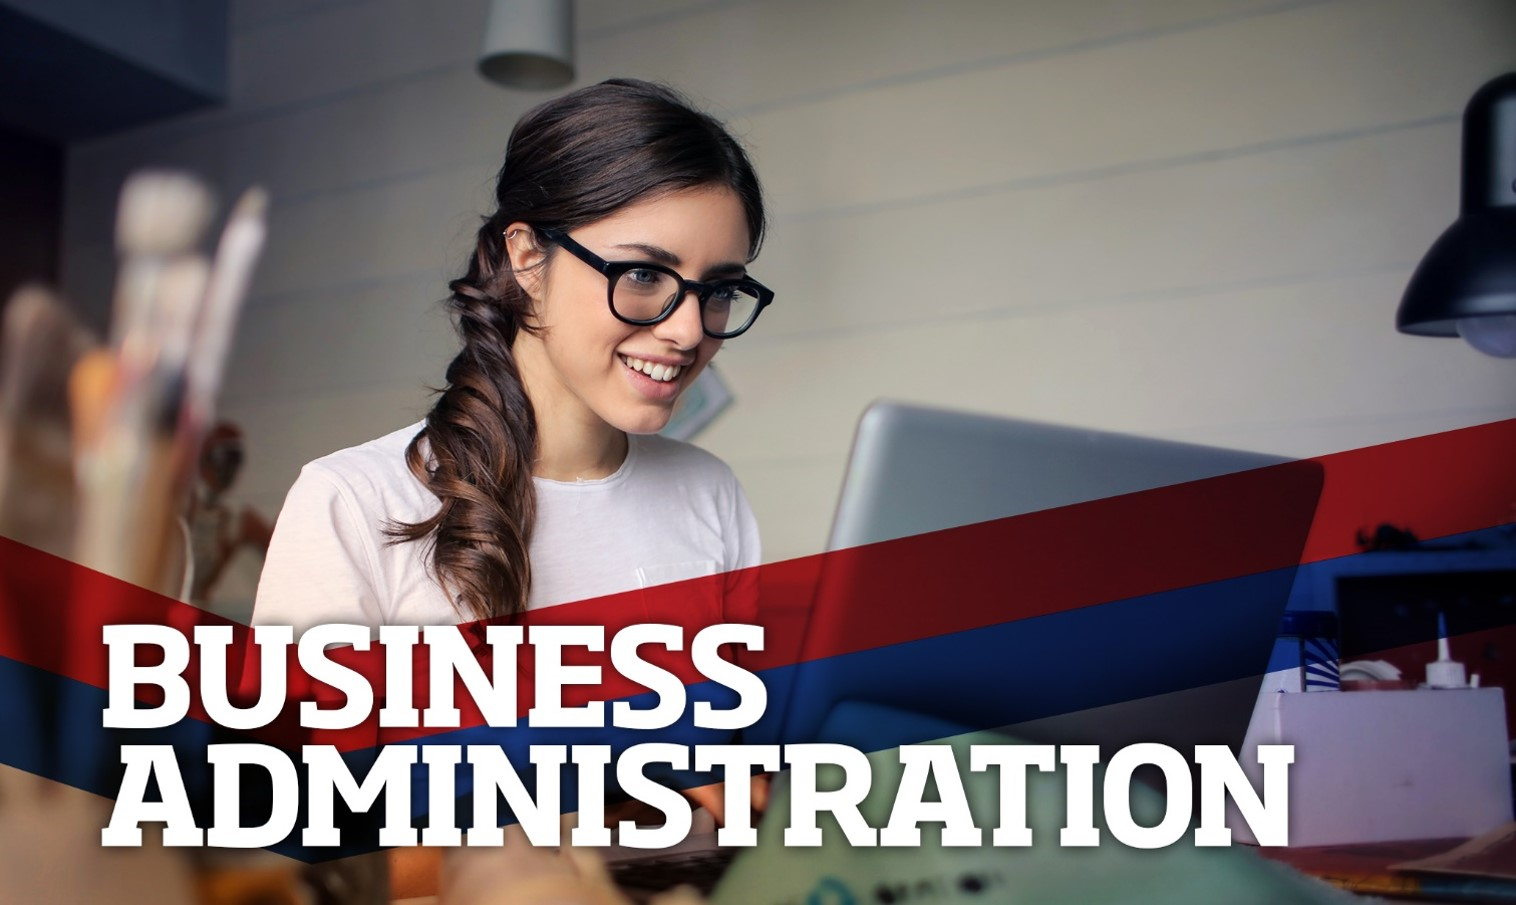 Etudes Travail au Canada - Business Administration